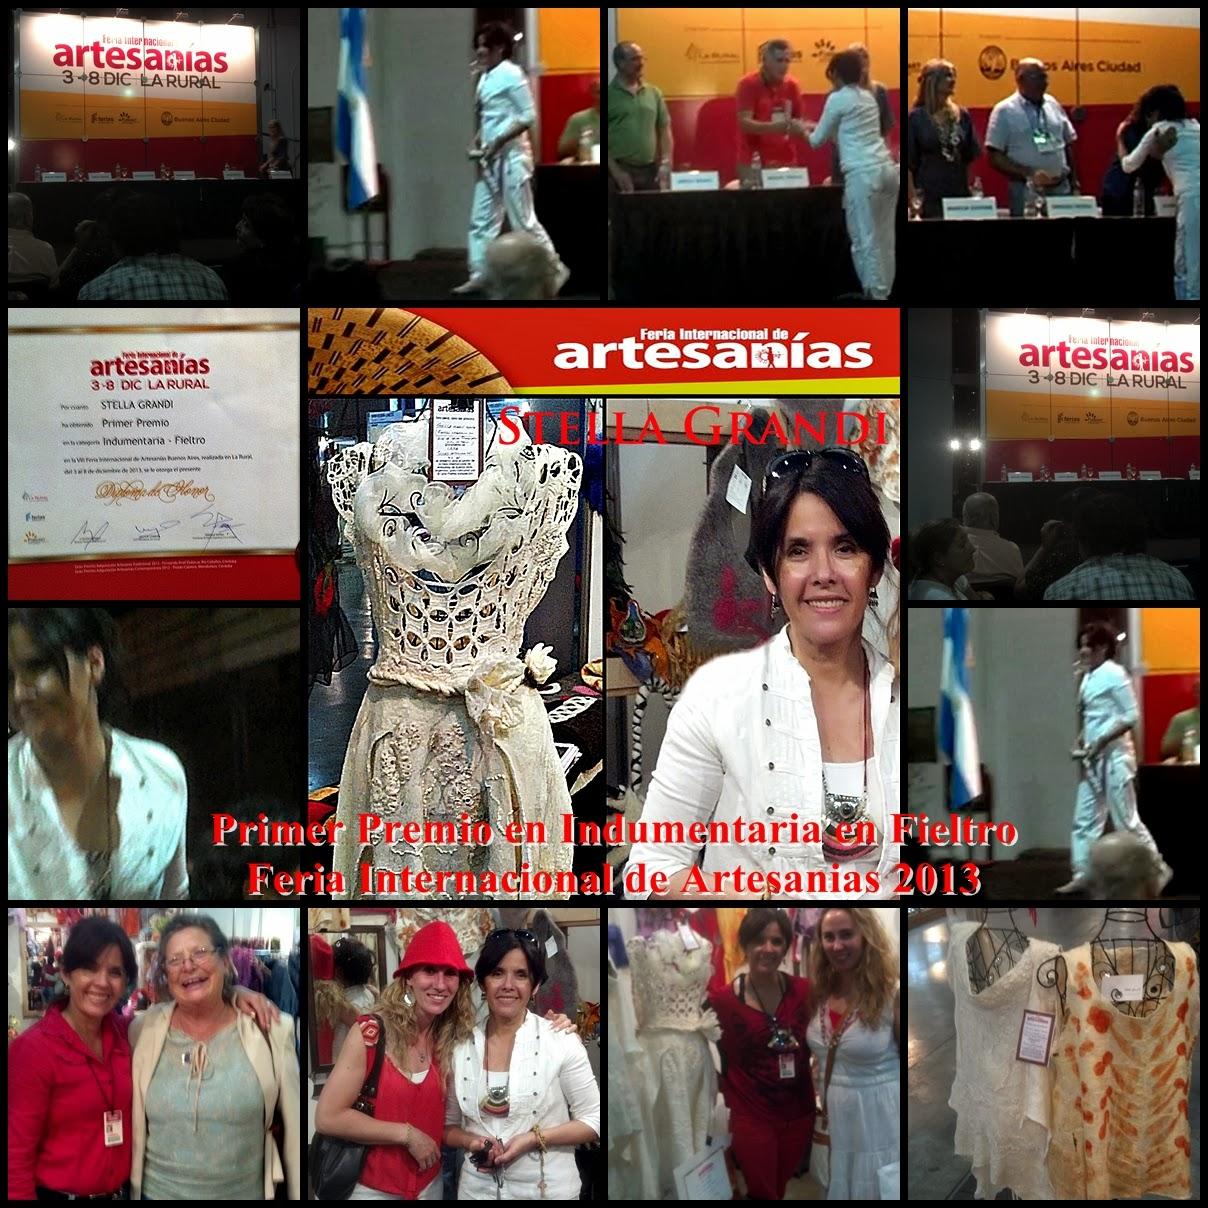 VIII FERIA INTERNACIONAL DE ARTESANIAS EN LA RURAL 2013 | STELLA GRANDI PRIMER PREMIO EN INDUMENTARIA EN FIELTRO